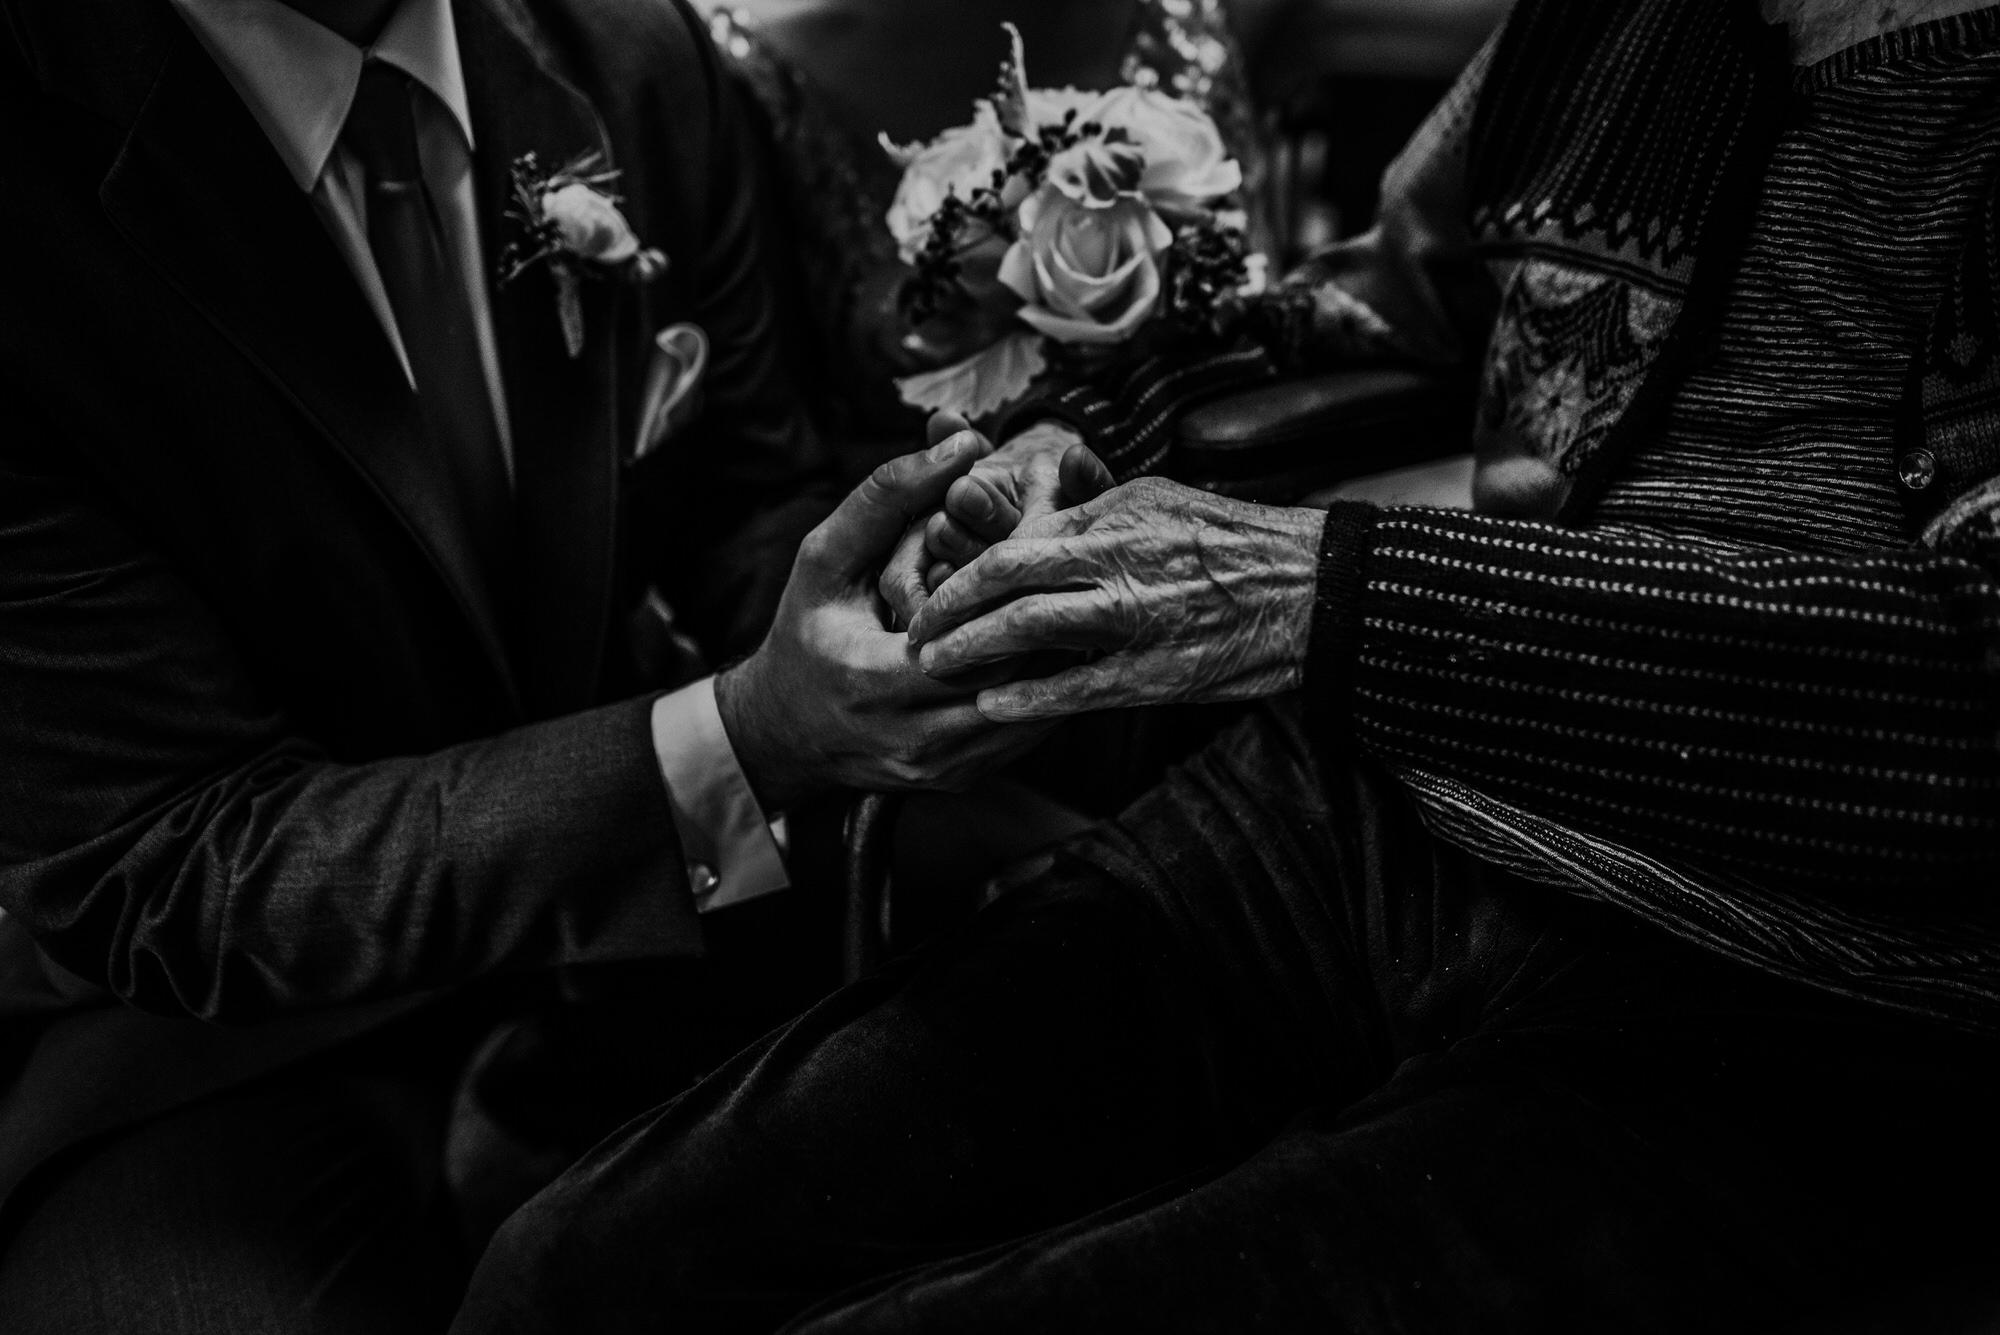 Kaylie_Sirek_Photography_Grand_Island_Kearney_Hastings_Lincoln_Nebraska_Wedding_Engagement_Grandma_Grandparent_Delray_Downtown_DowntownLincoln_LNK_Emotional_Bride_Groom_Photographer_39.jpg